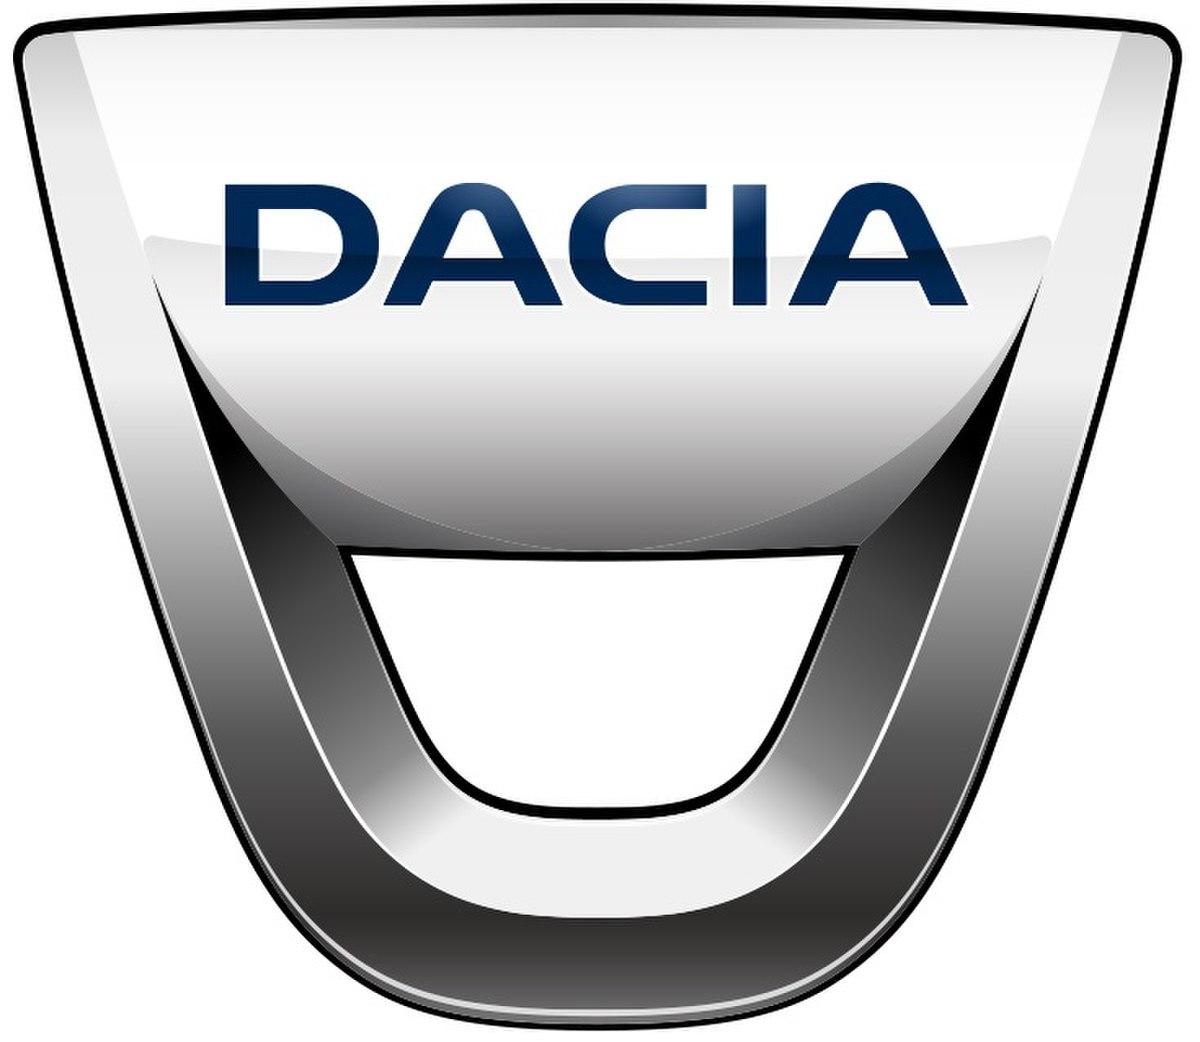 Ͽ������ Ͽ�������� Ͽ���� Ͽ������������������ Ͽ�������� Ͽ��������: Dacia (autótípus)